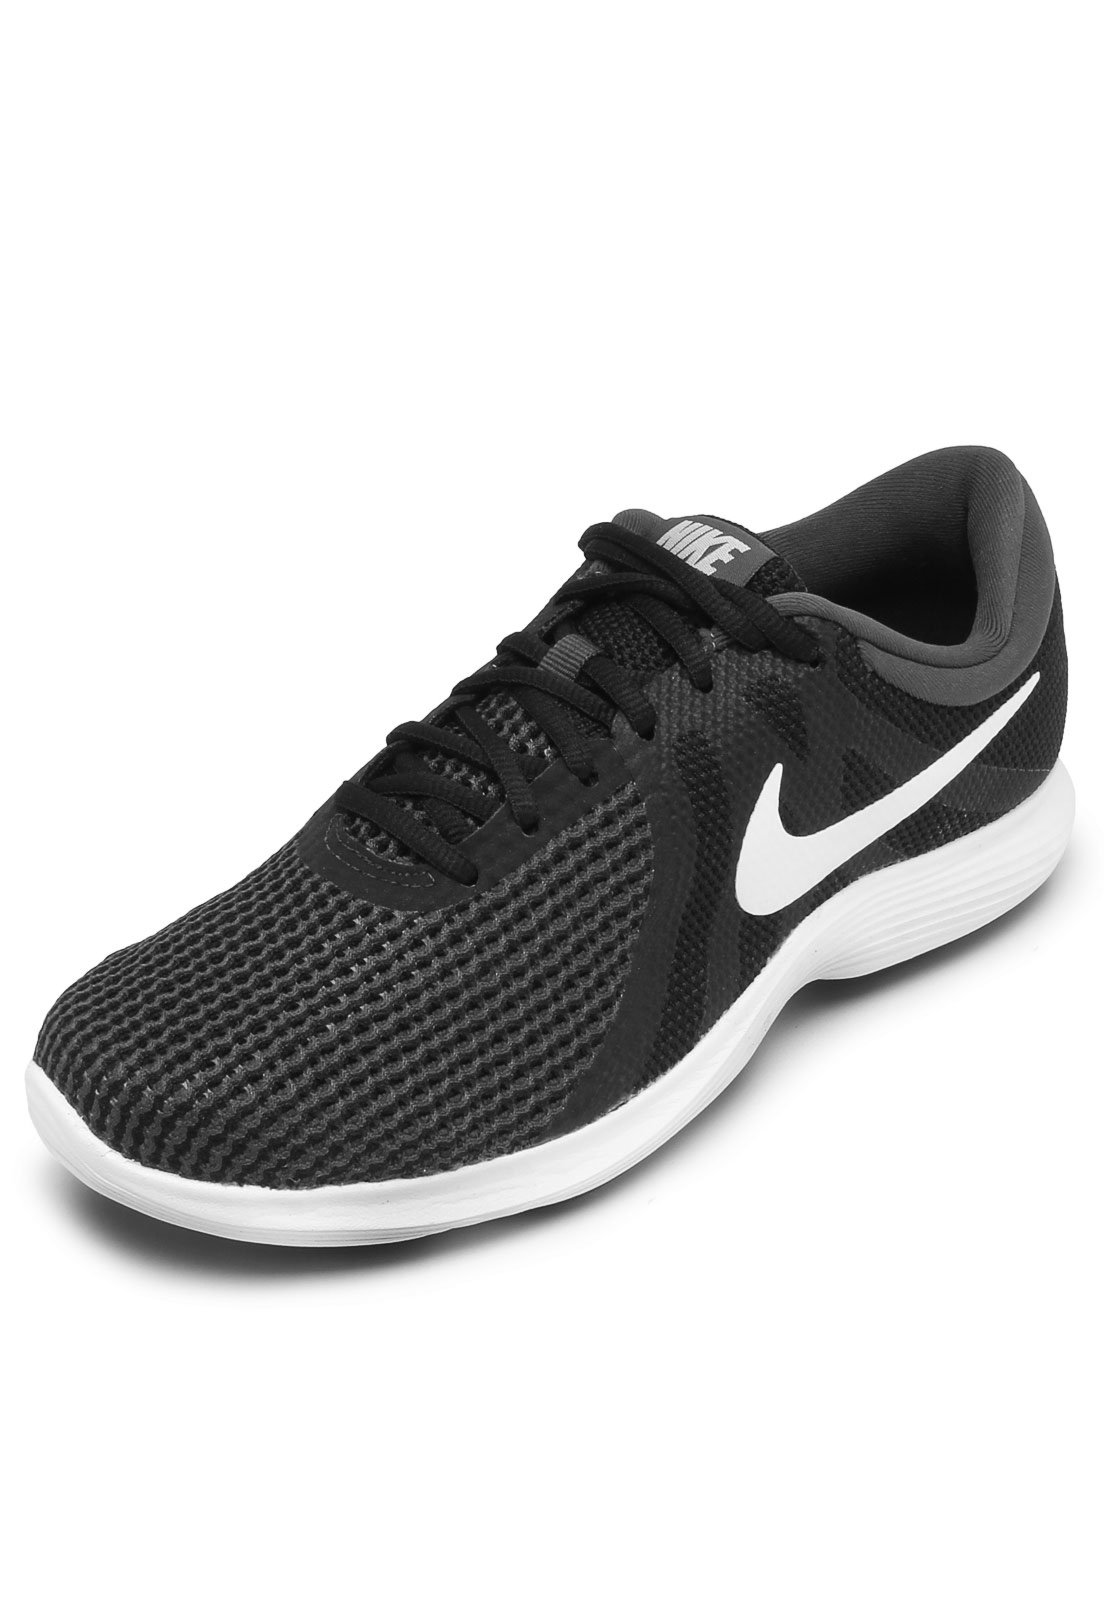 quality design 5b70f be3f7 Tênis Nike Revolution 4 Preto/Branco - Compre Agora | Kanui Brasil